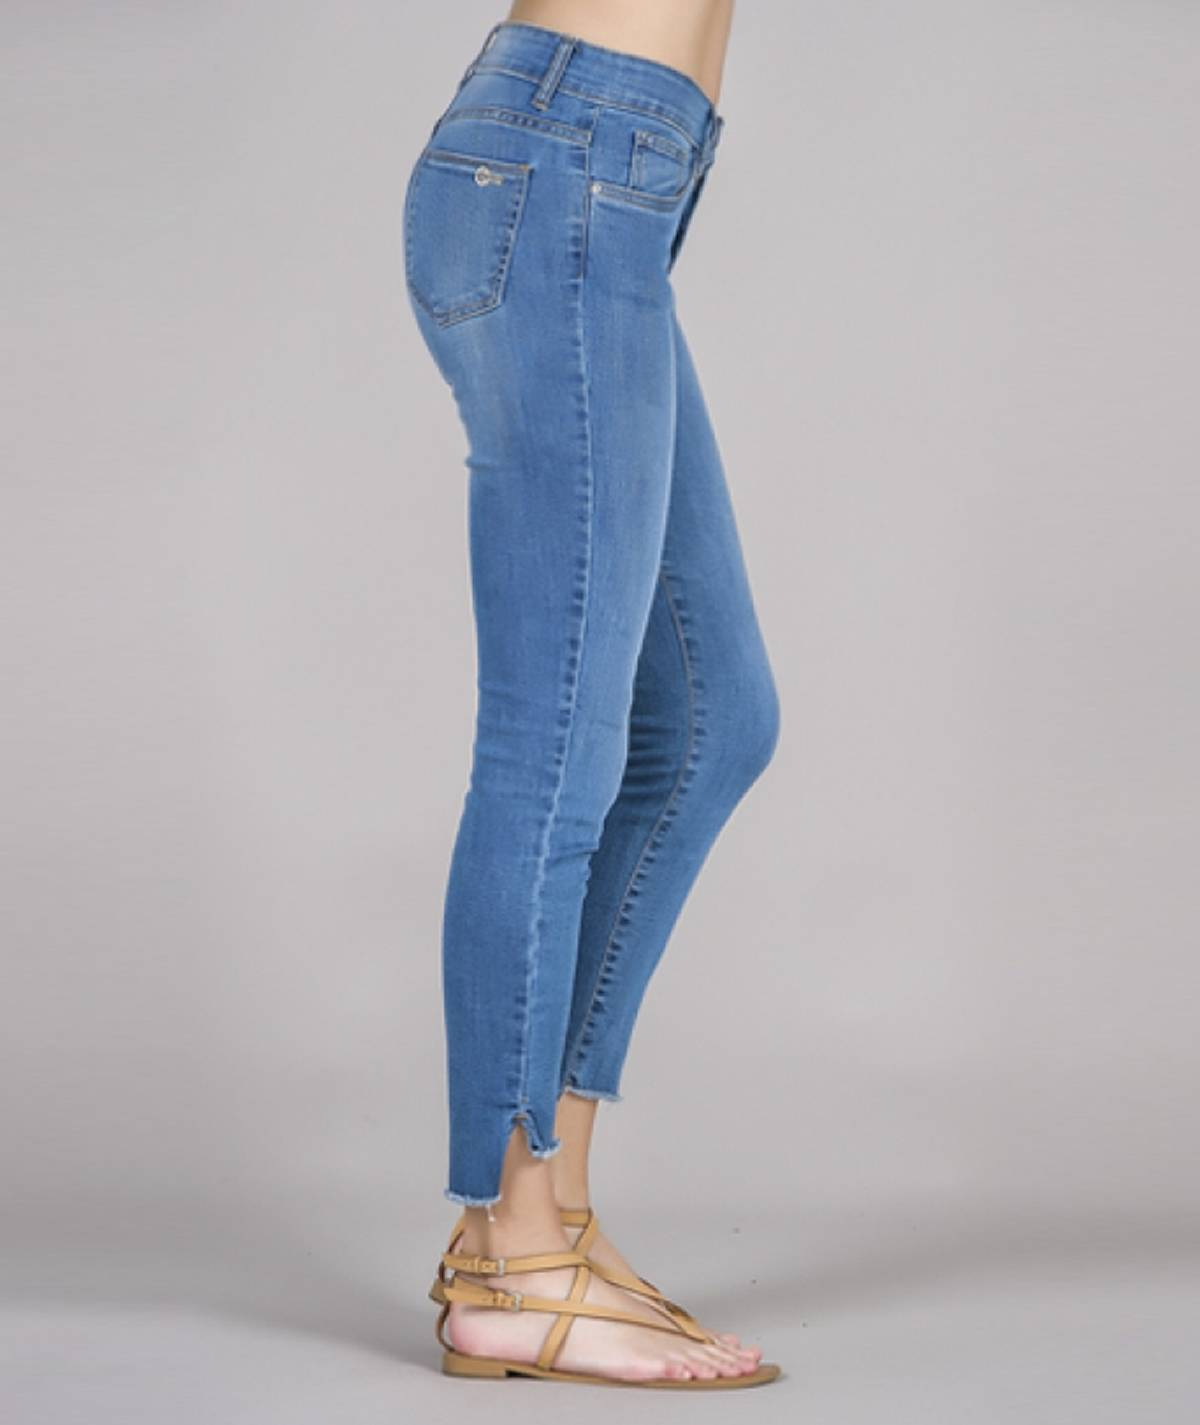 [CHIESSY] Jeans skinny